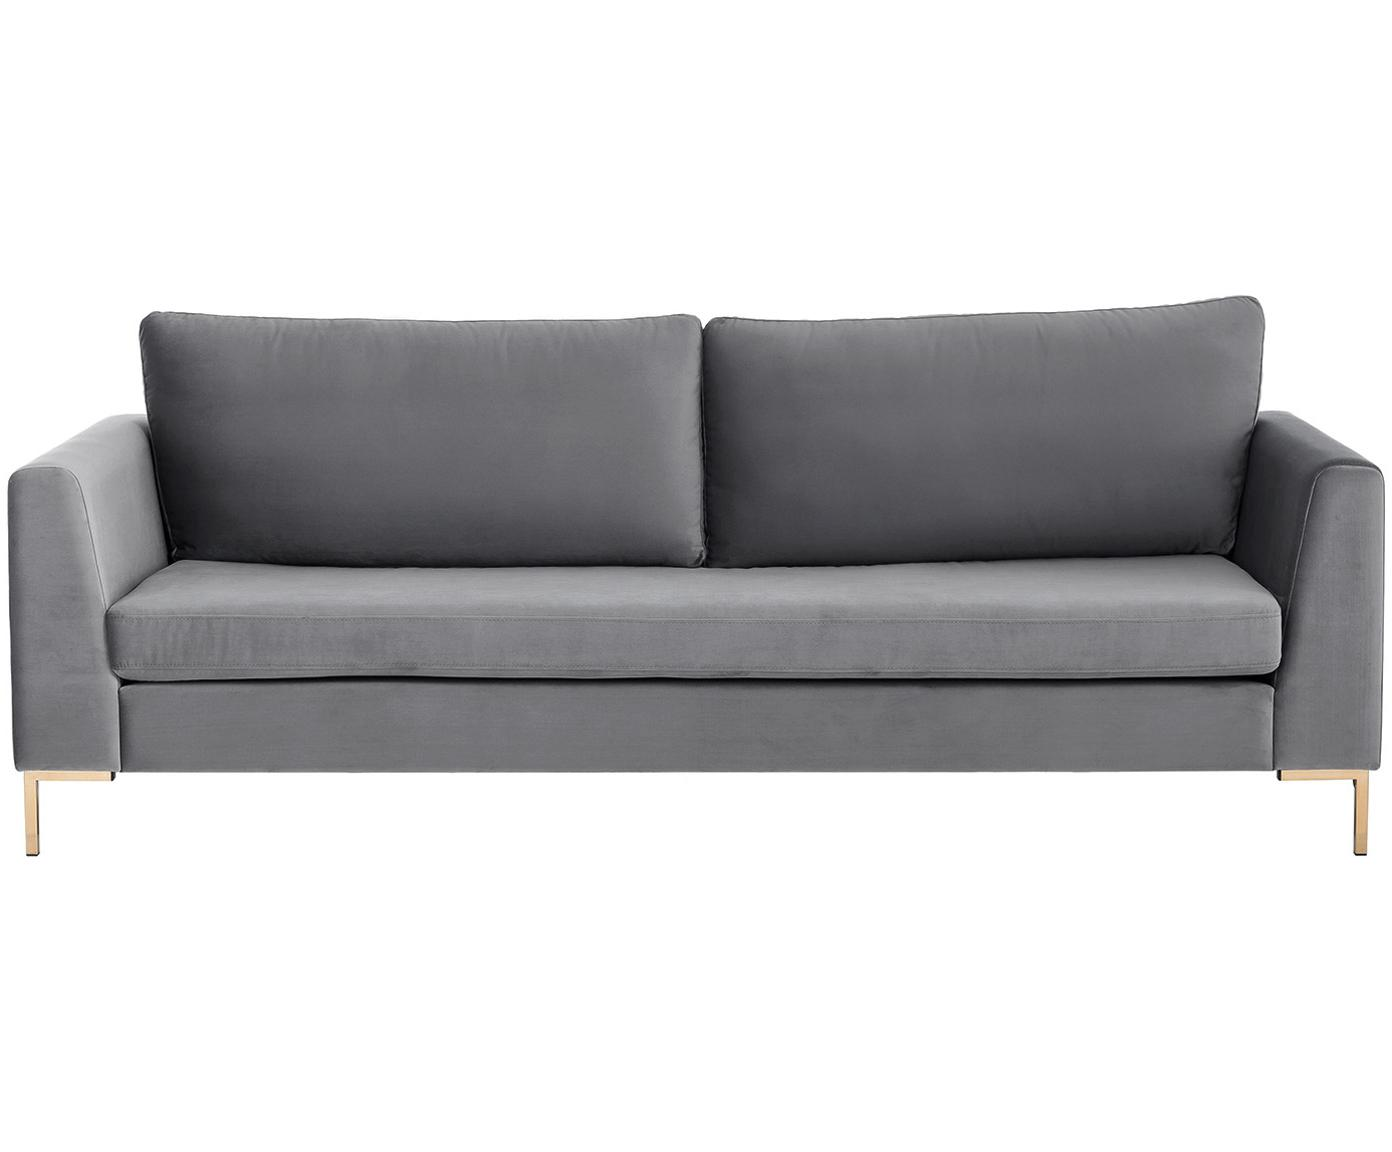 Samt-Sofa Luna (3-Sitzer), Bezug: Samt (Polyester) 80.000 S, Gestell: Massives Buchenholz, Füße: Metall, galvanisiert, Samt Dunkelgrau, Gold, B 230 x T 95 cm